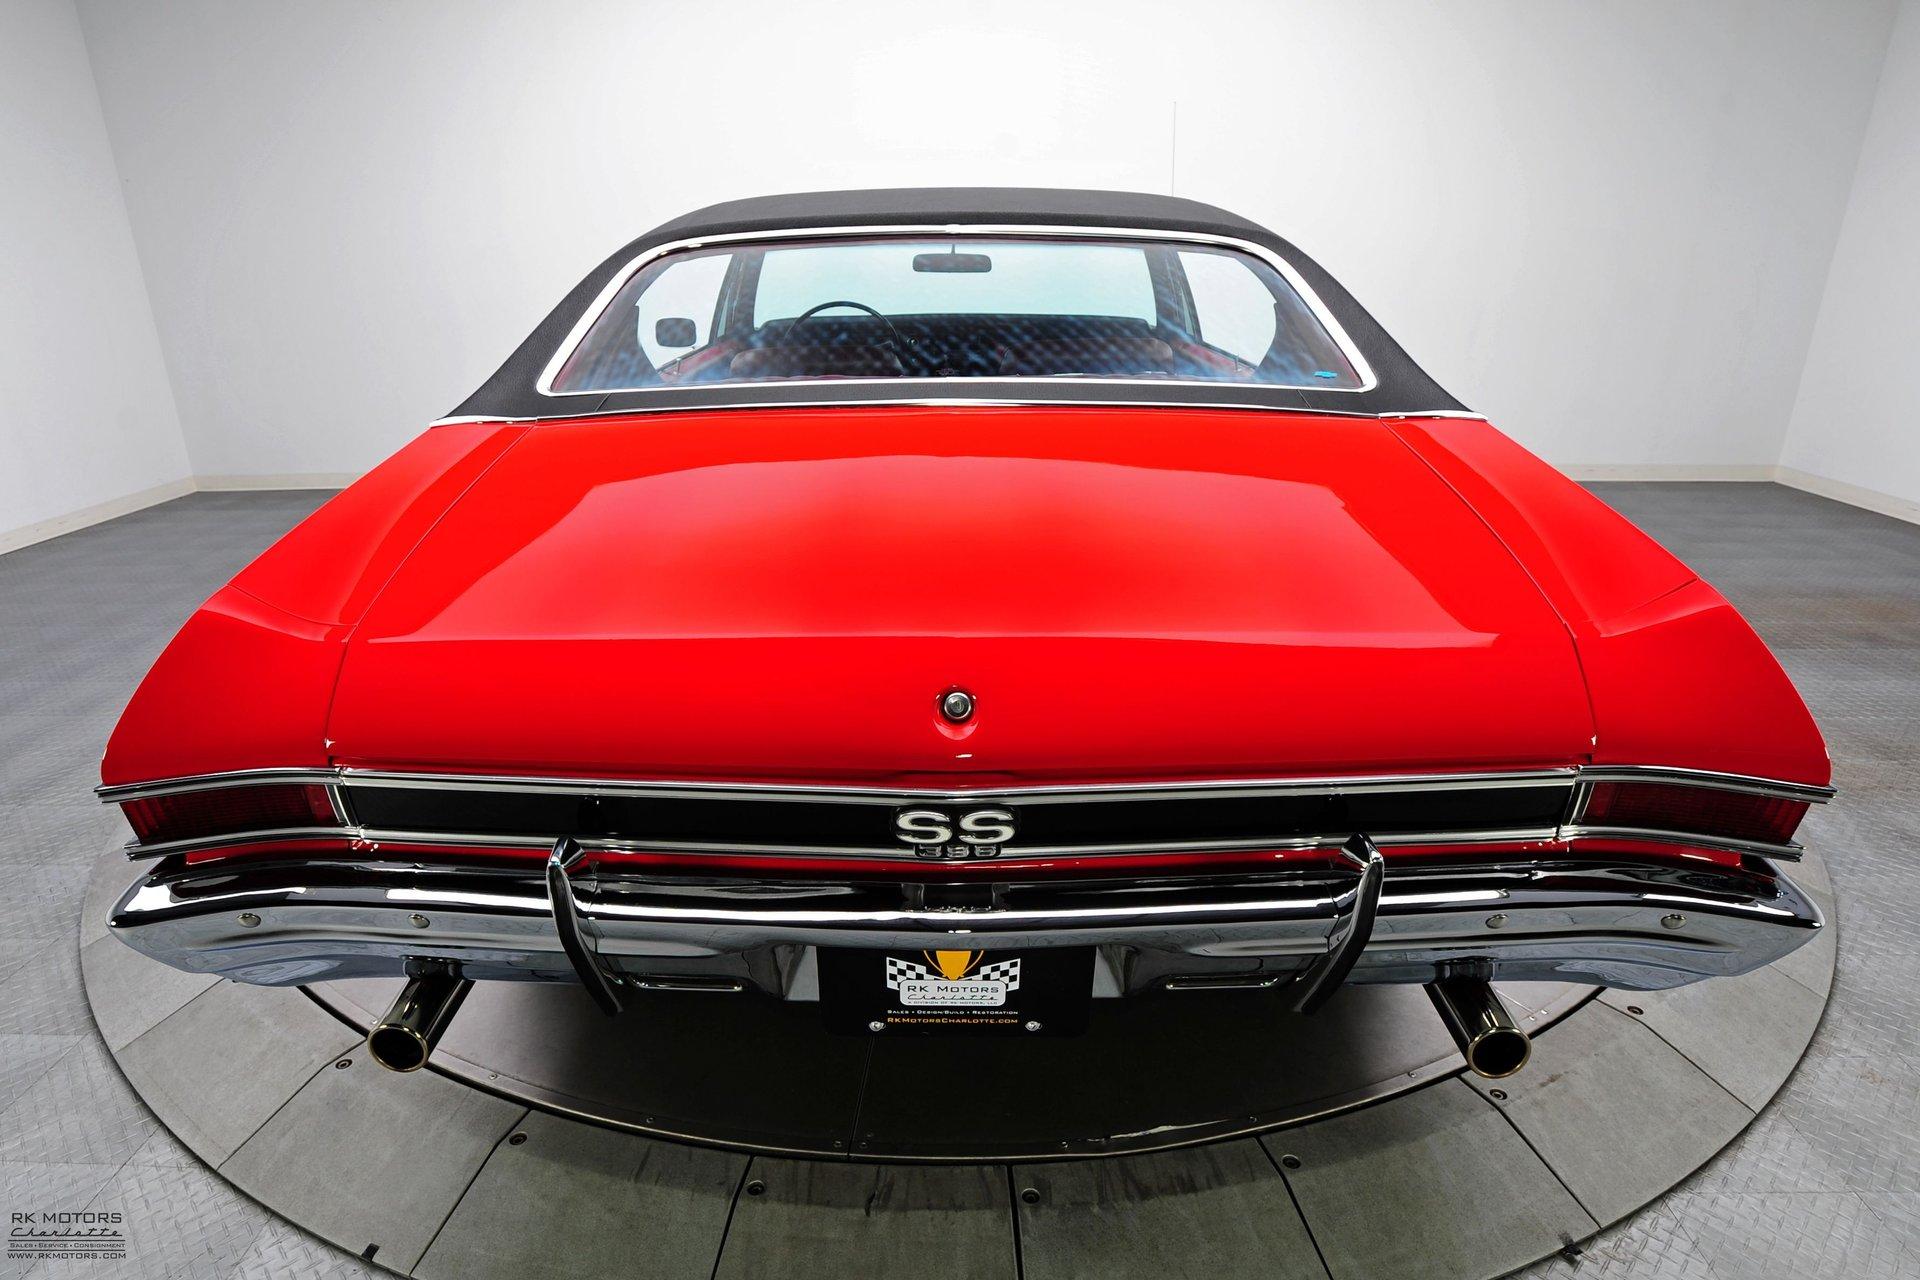 133073 1968 Chevrolet Chevelle RK Motors Classic Cars for Sale